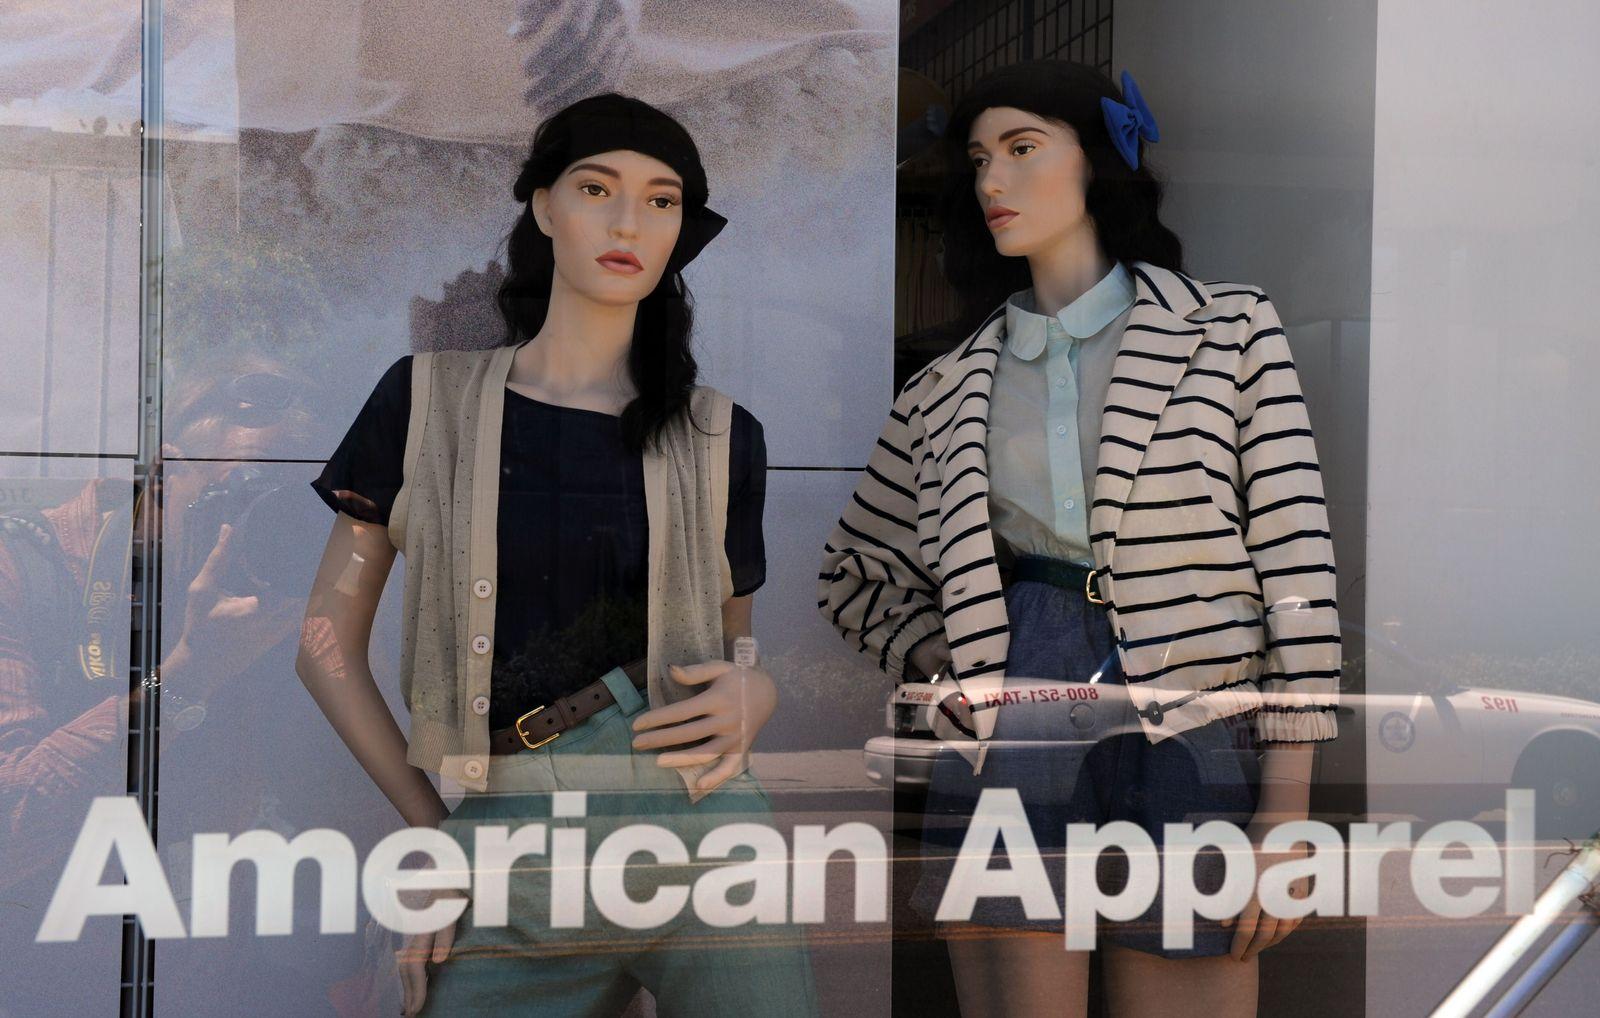 American Apparel / Schaufenster / Mode